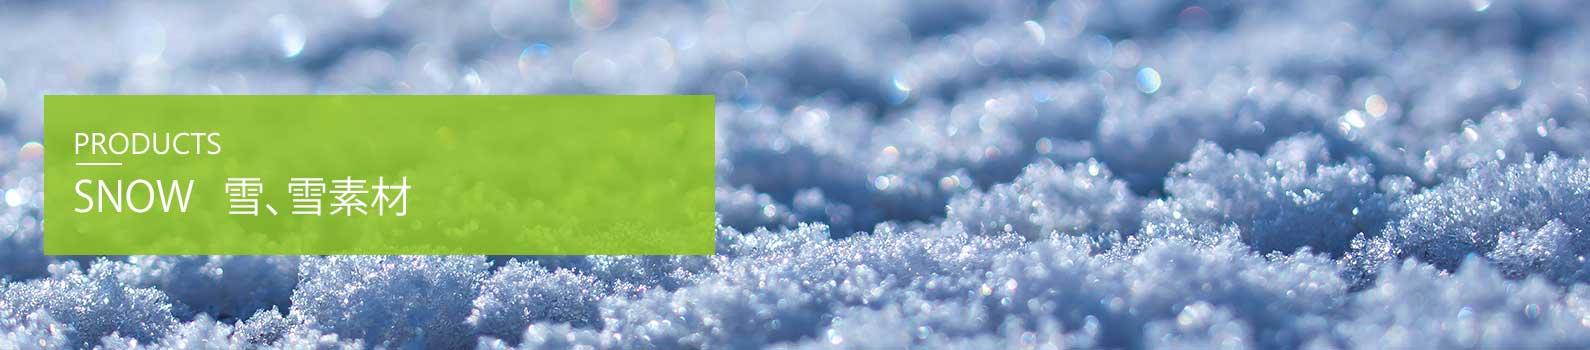 SNOW 雪、雪素材